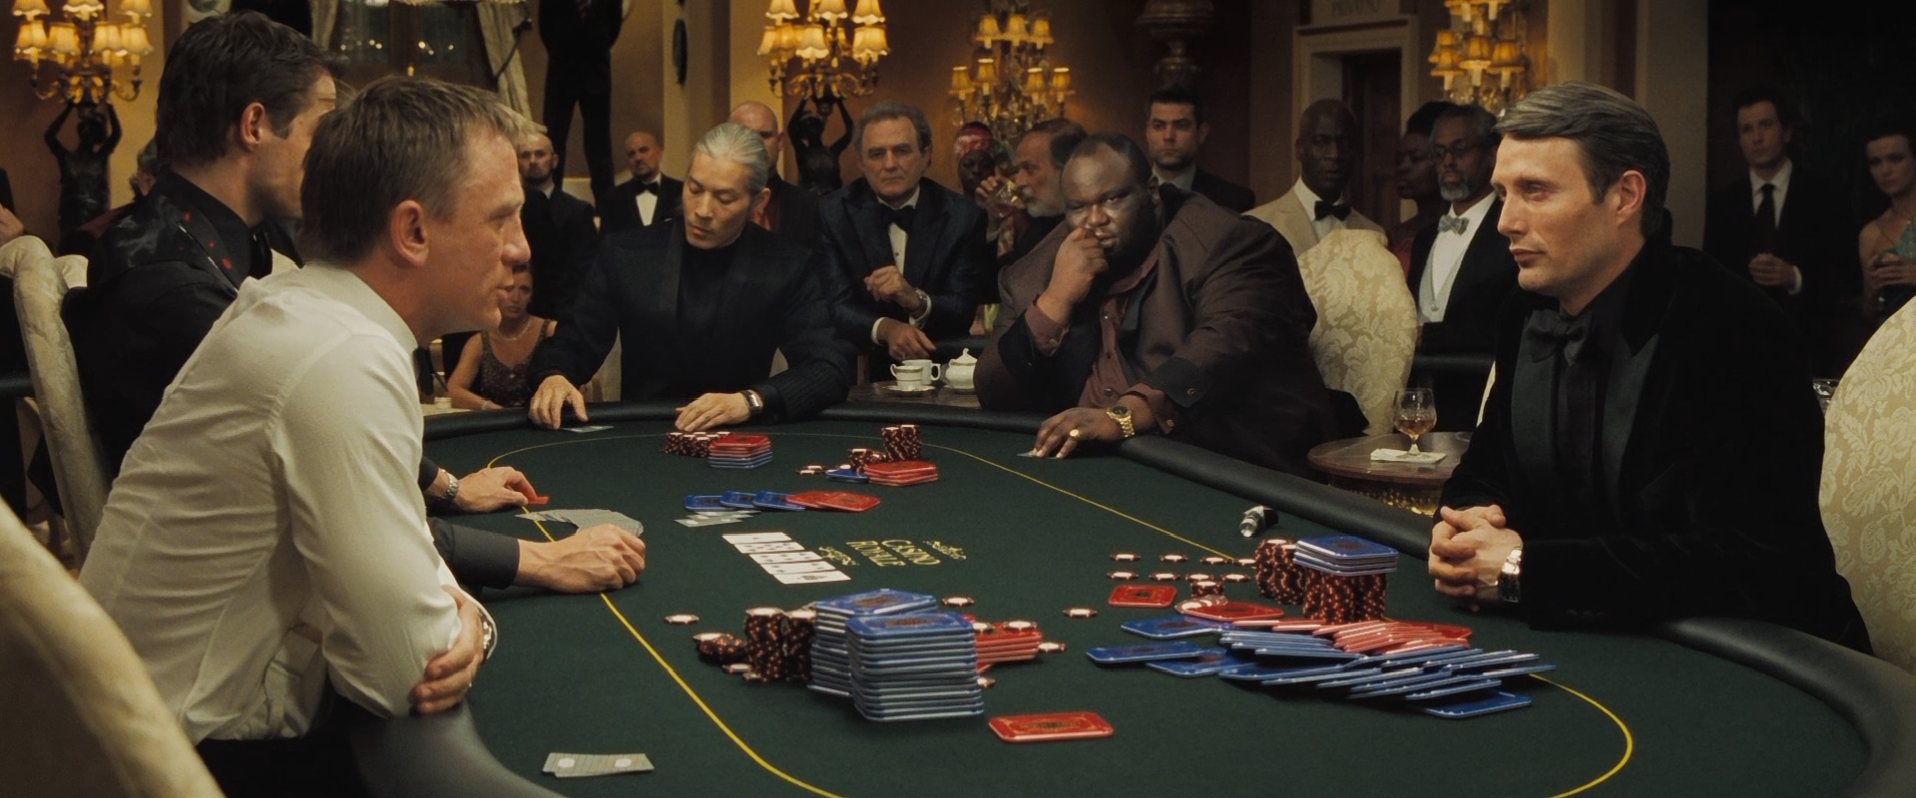 James bond poker scenes free vegas slot games to play